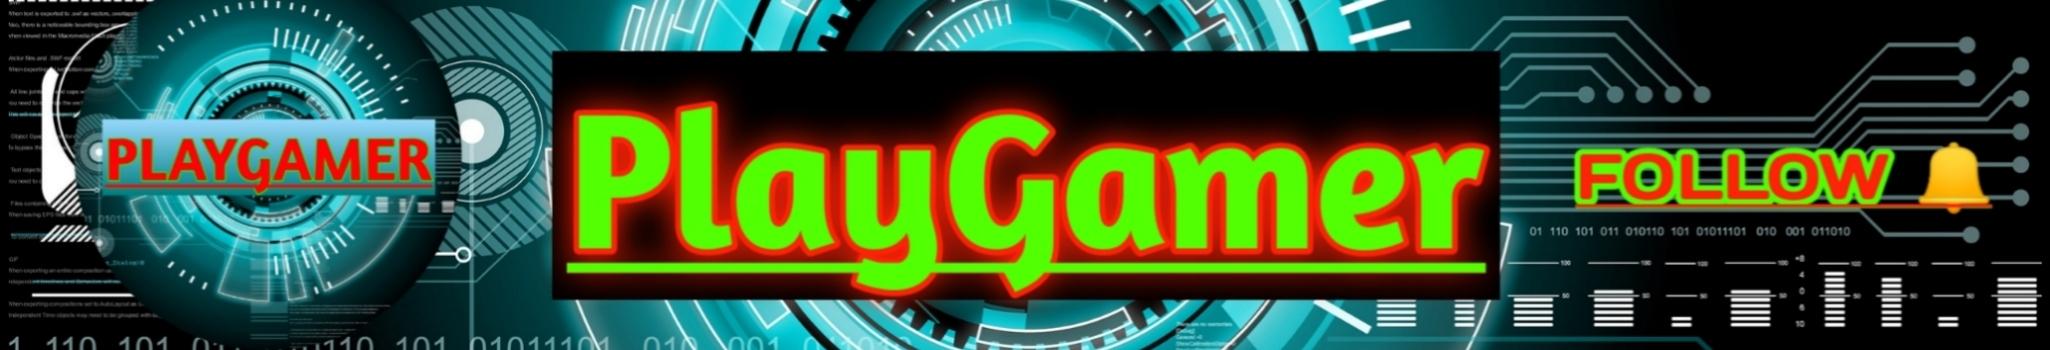 PLAYGAMER